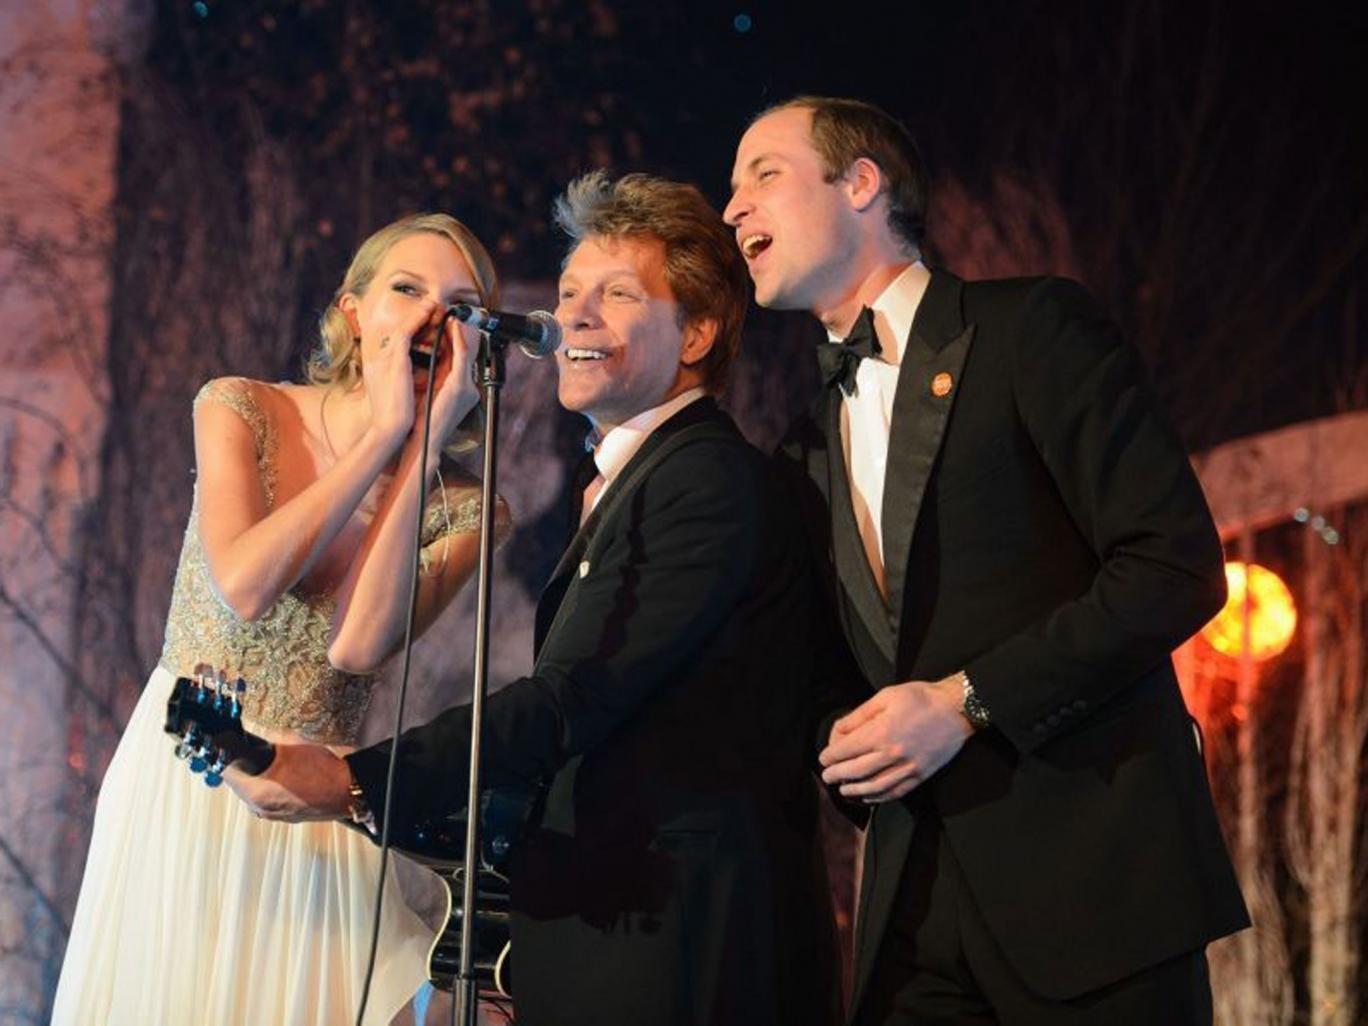 The Duke of Cambridge singing with Taylor Swift and Jon Bon Jovi at the Centrepoint Gala Dinner at Kensington Palace, London